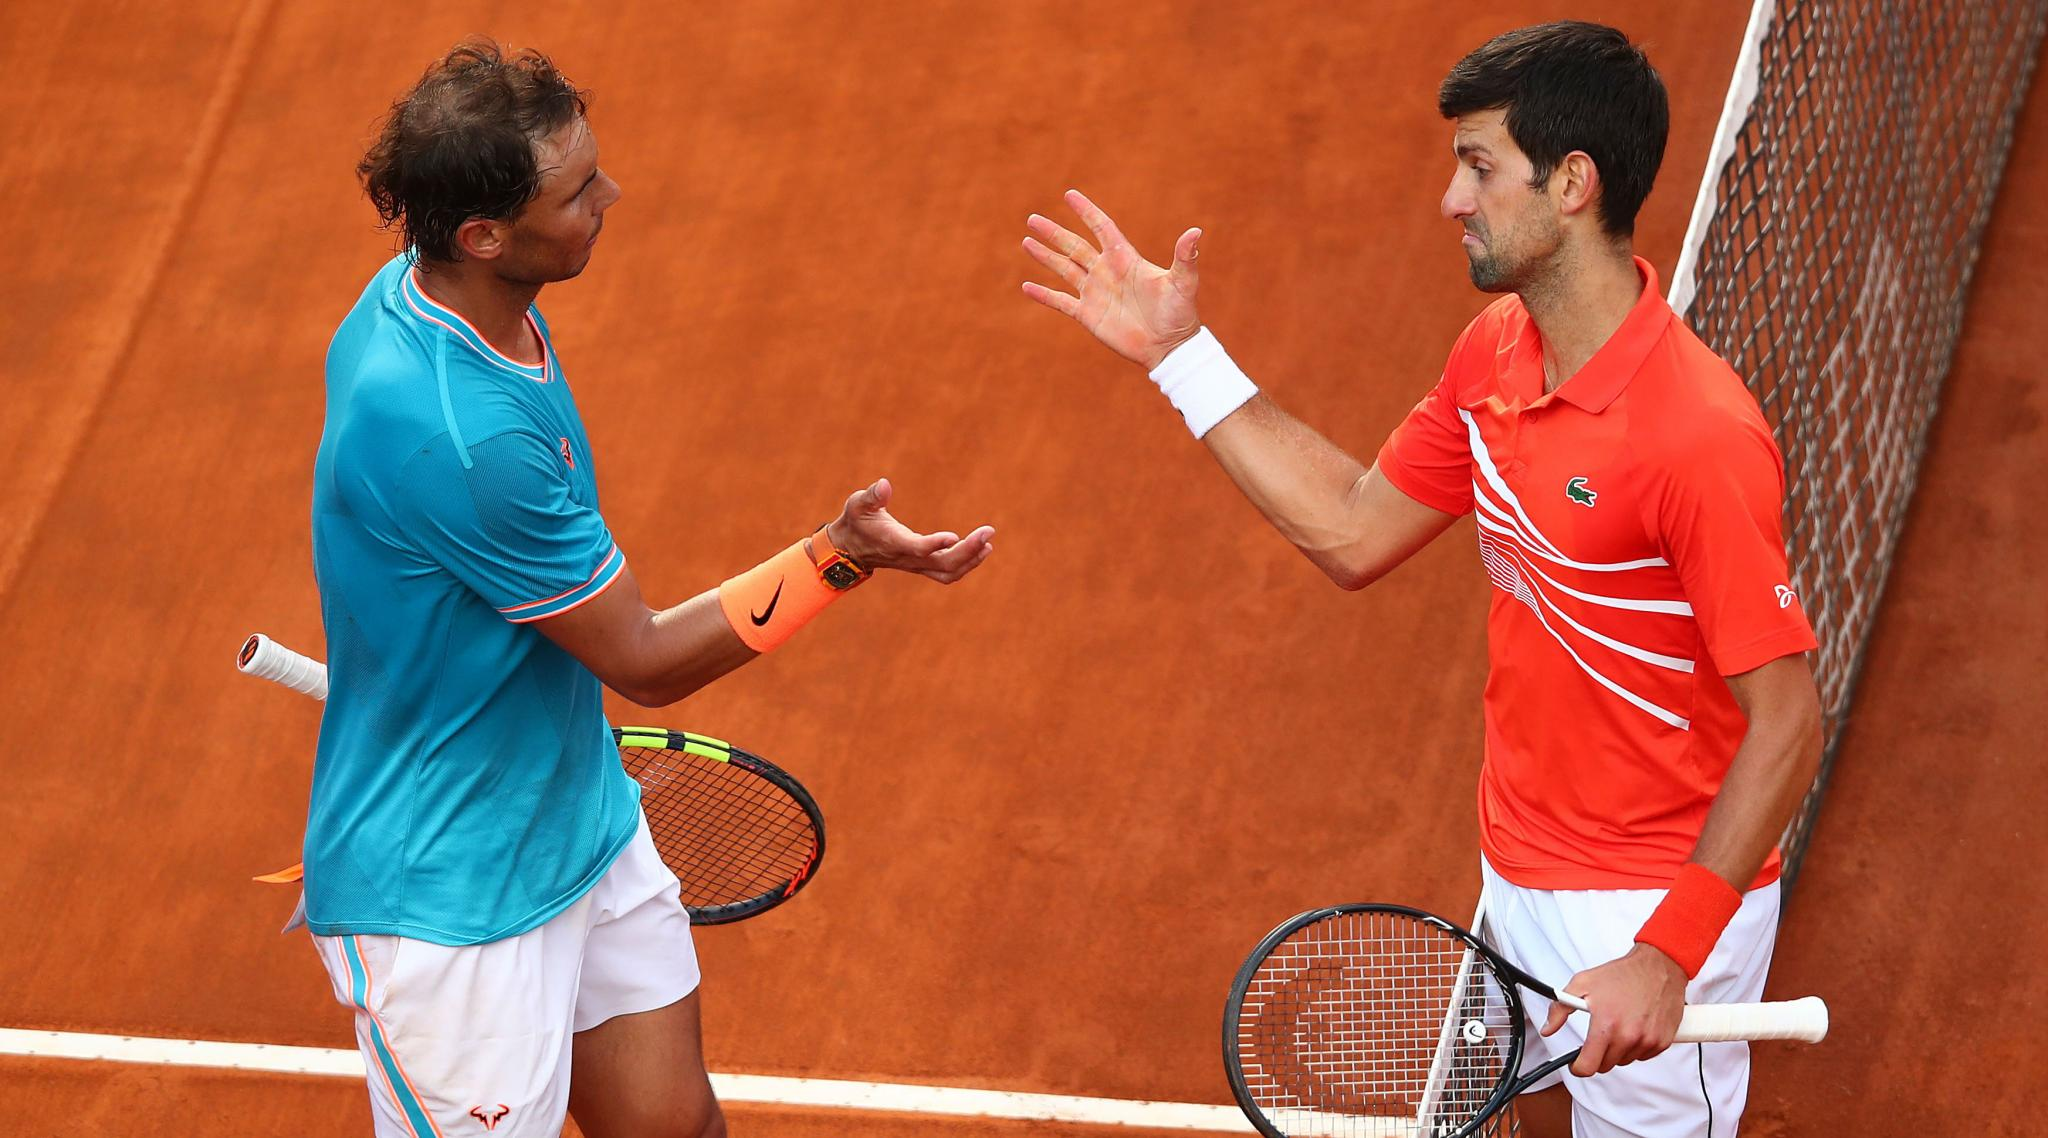 Novak Djokovic vs Rafael Nadal, ATP Cup 2020 Final Match Preview: Clash of Titans in Serbia vs Spain Summit Clash